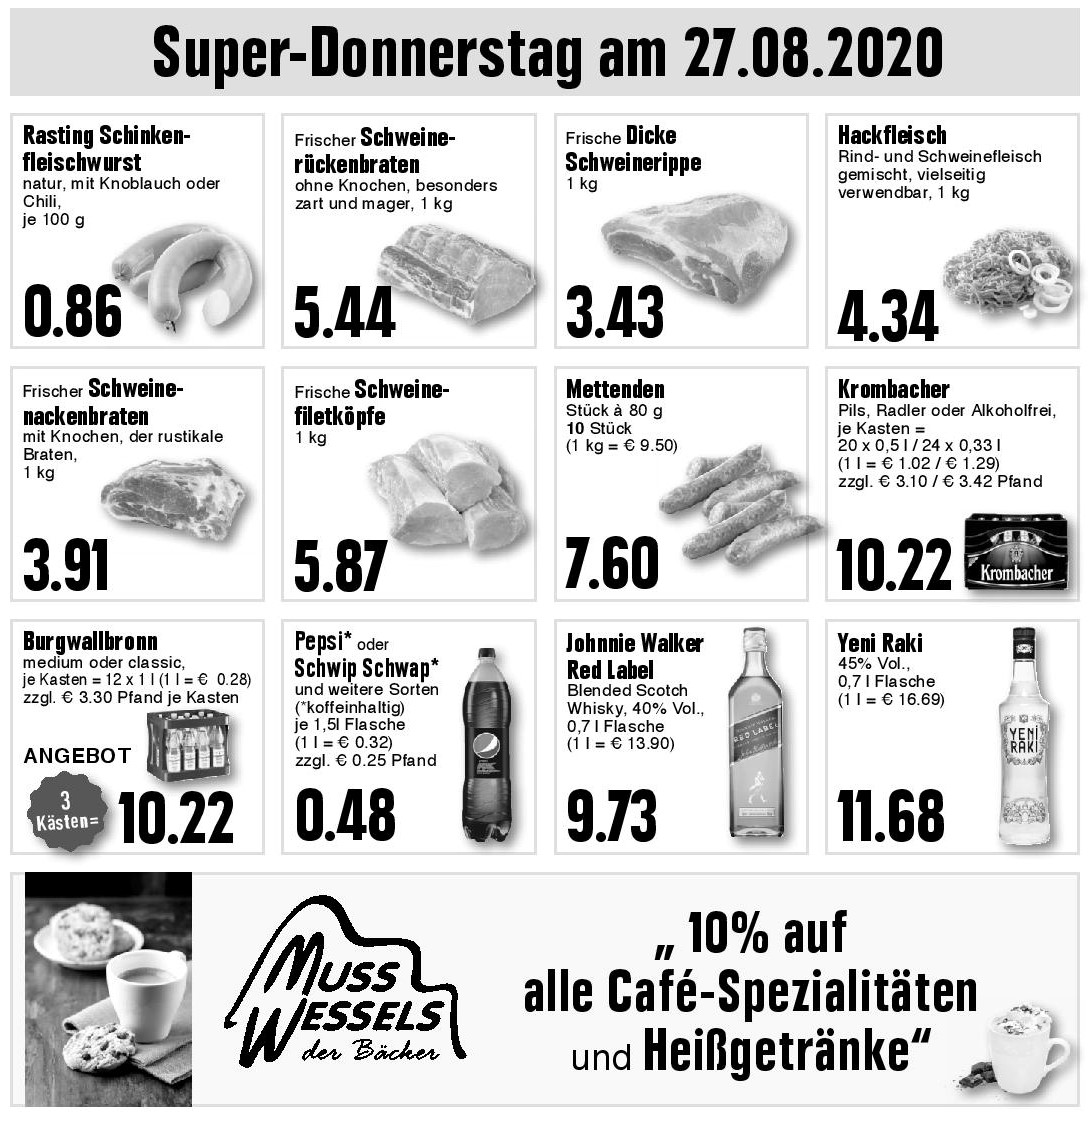 Super-Donnerstag am 27.08.2020!